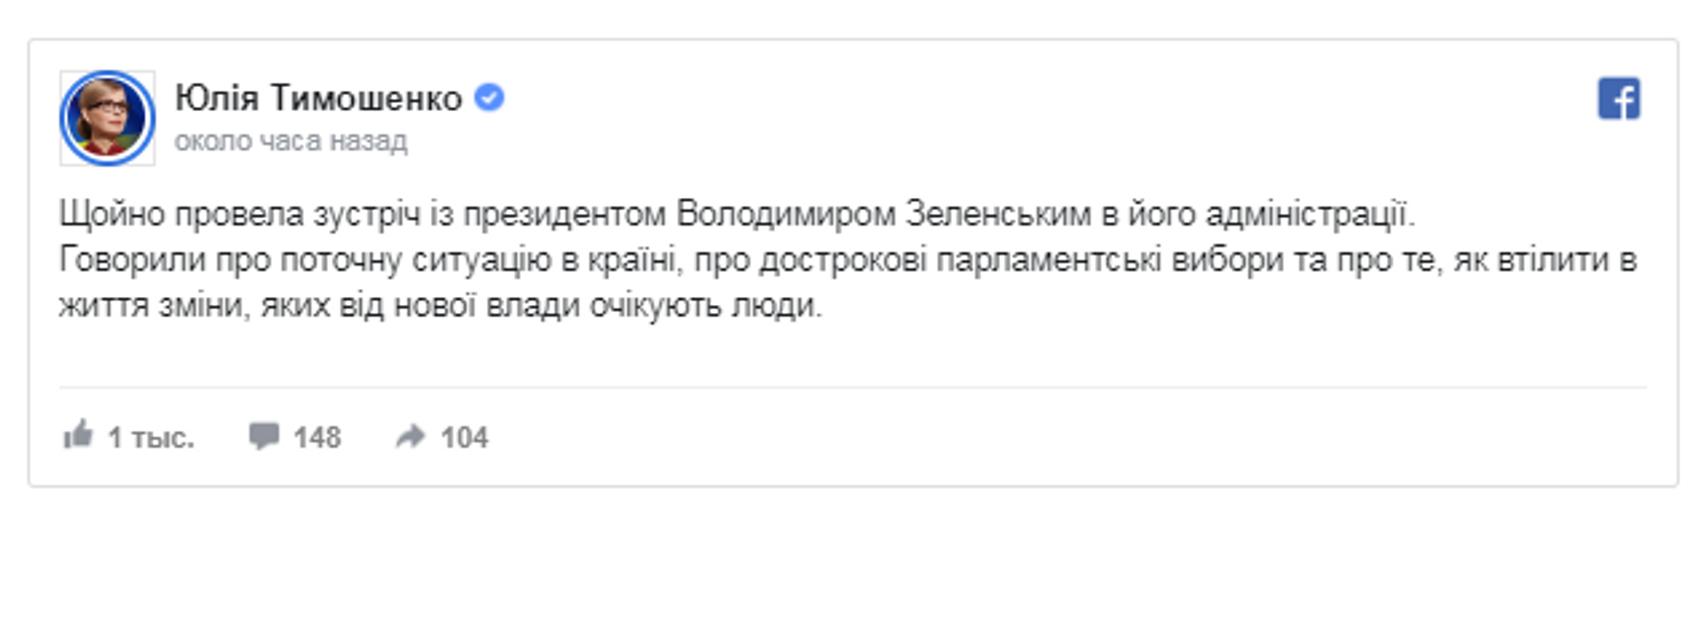 Тимошенко встретилась с Зеленским. О чем они говорили? - фото 182618